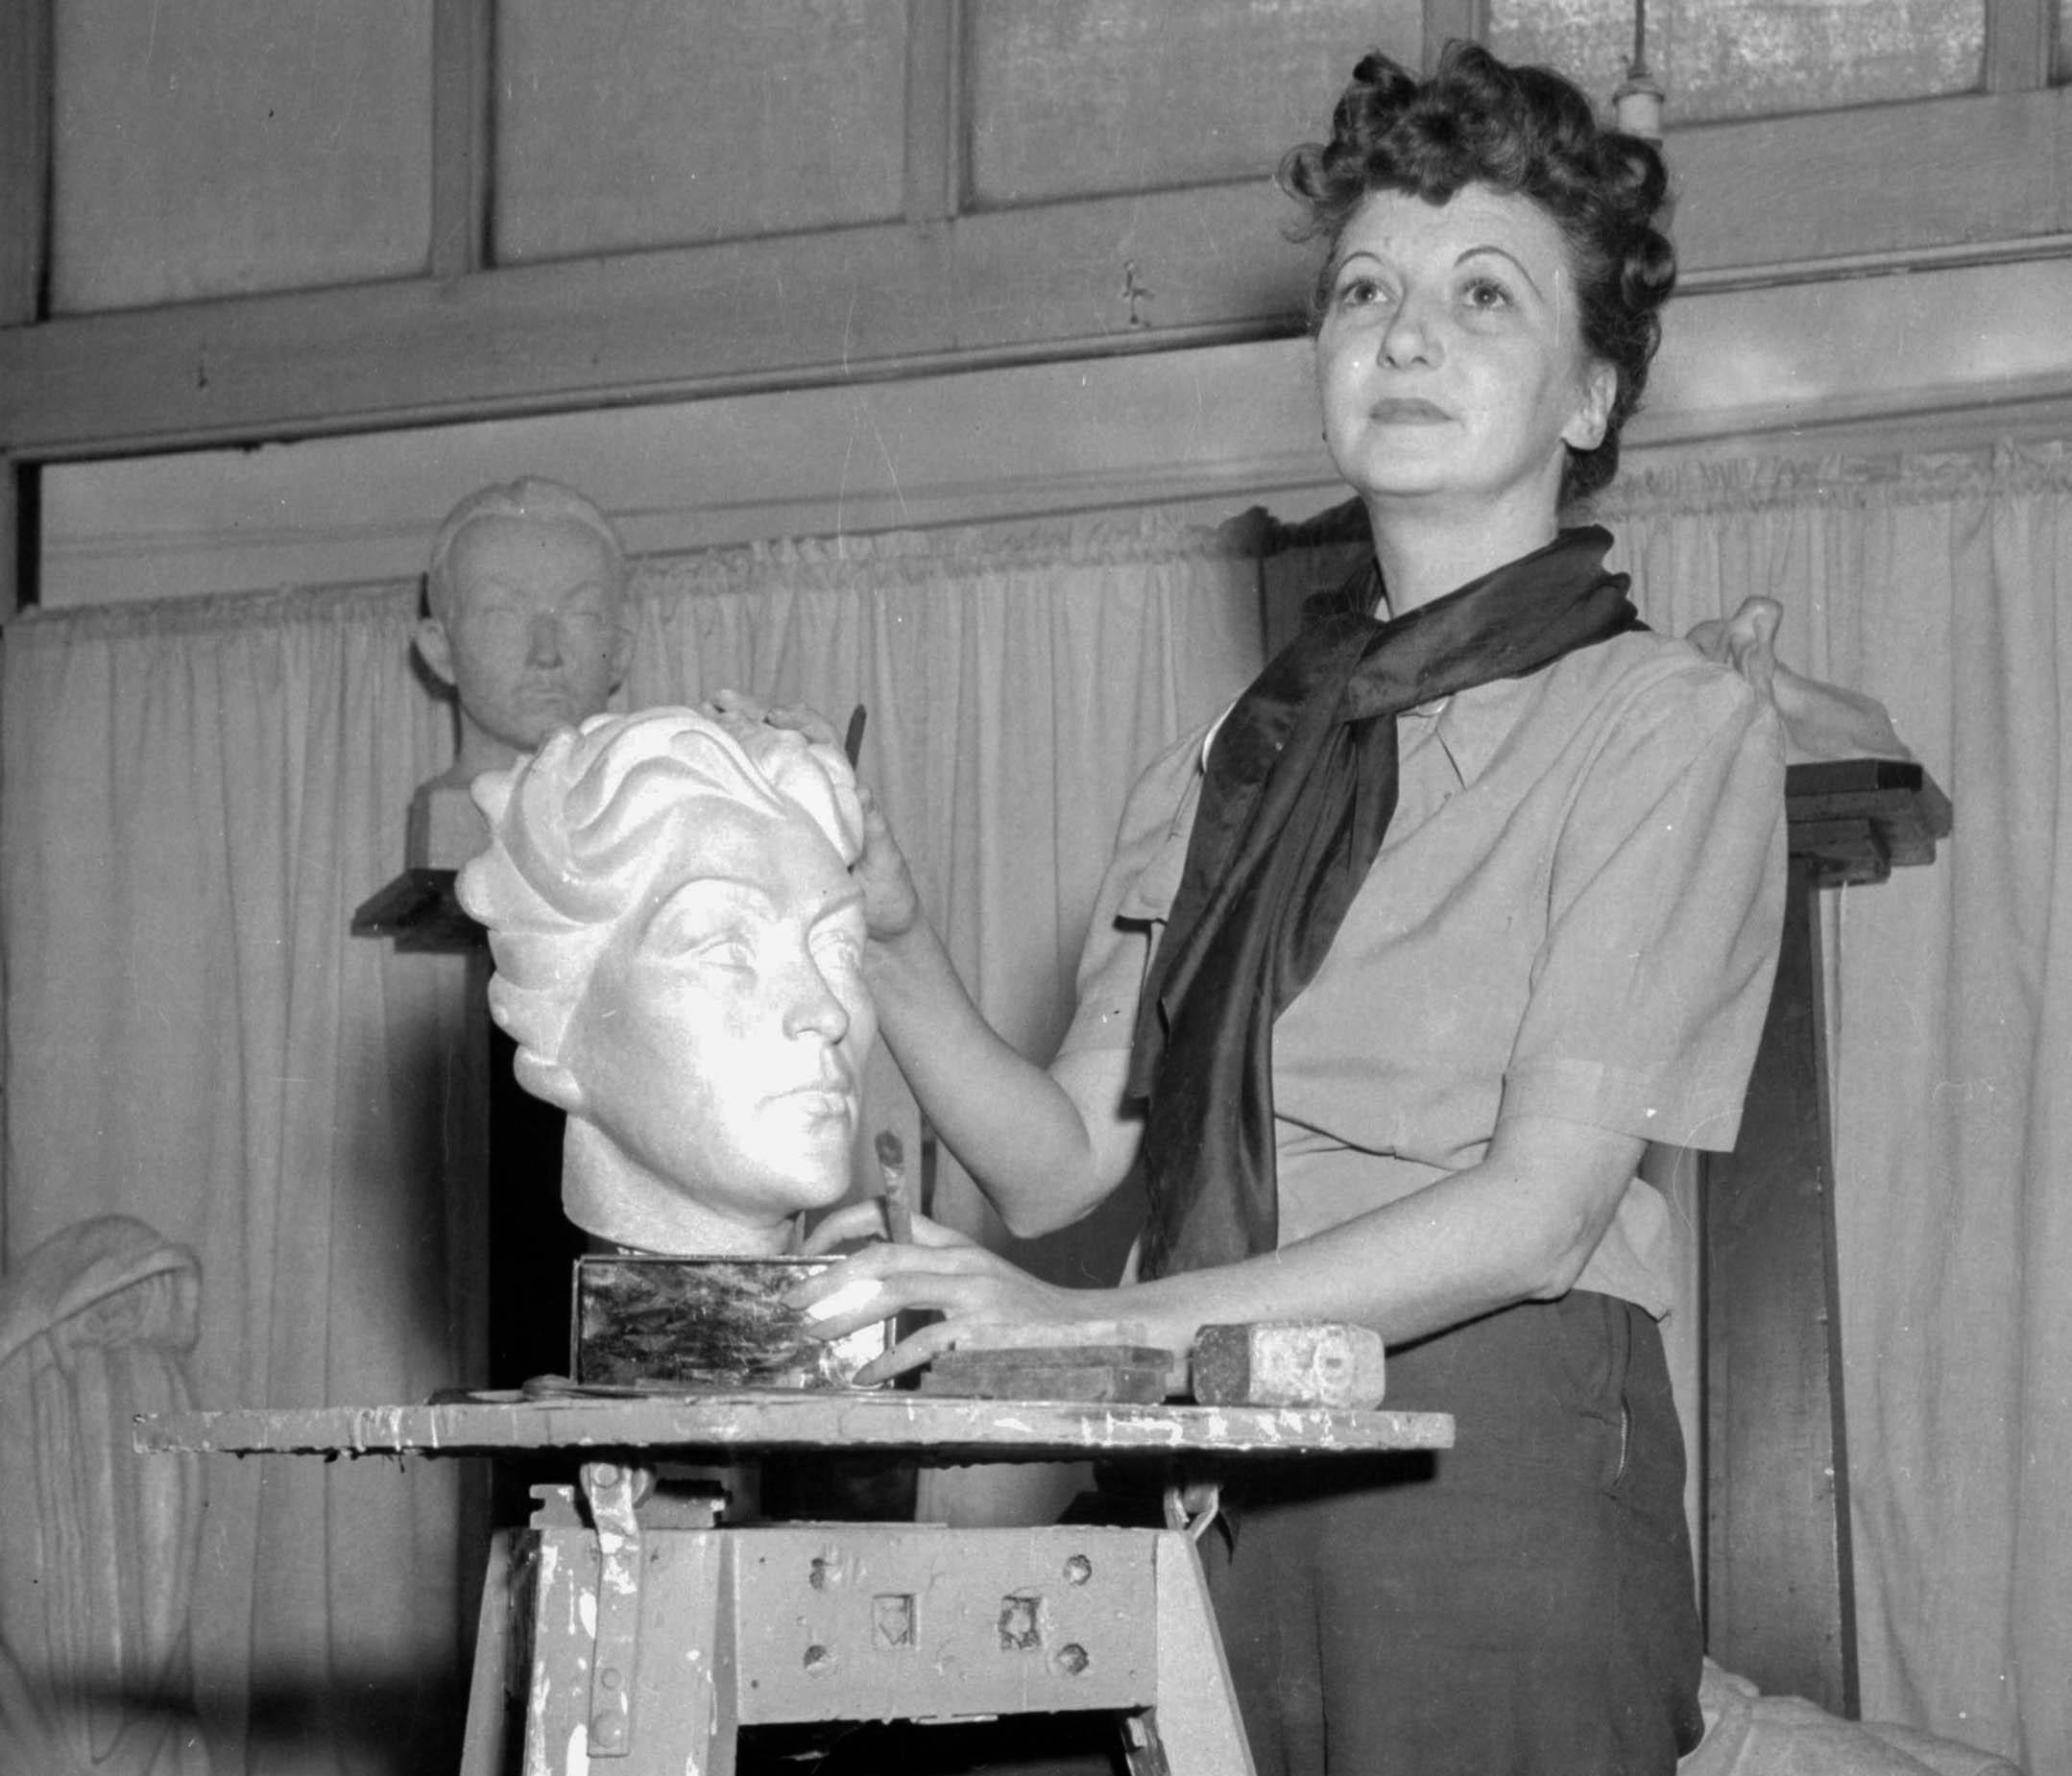 CVA 1184-1129 - [Sculptor at work] 1940-48 Jack Lindsay